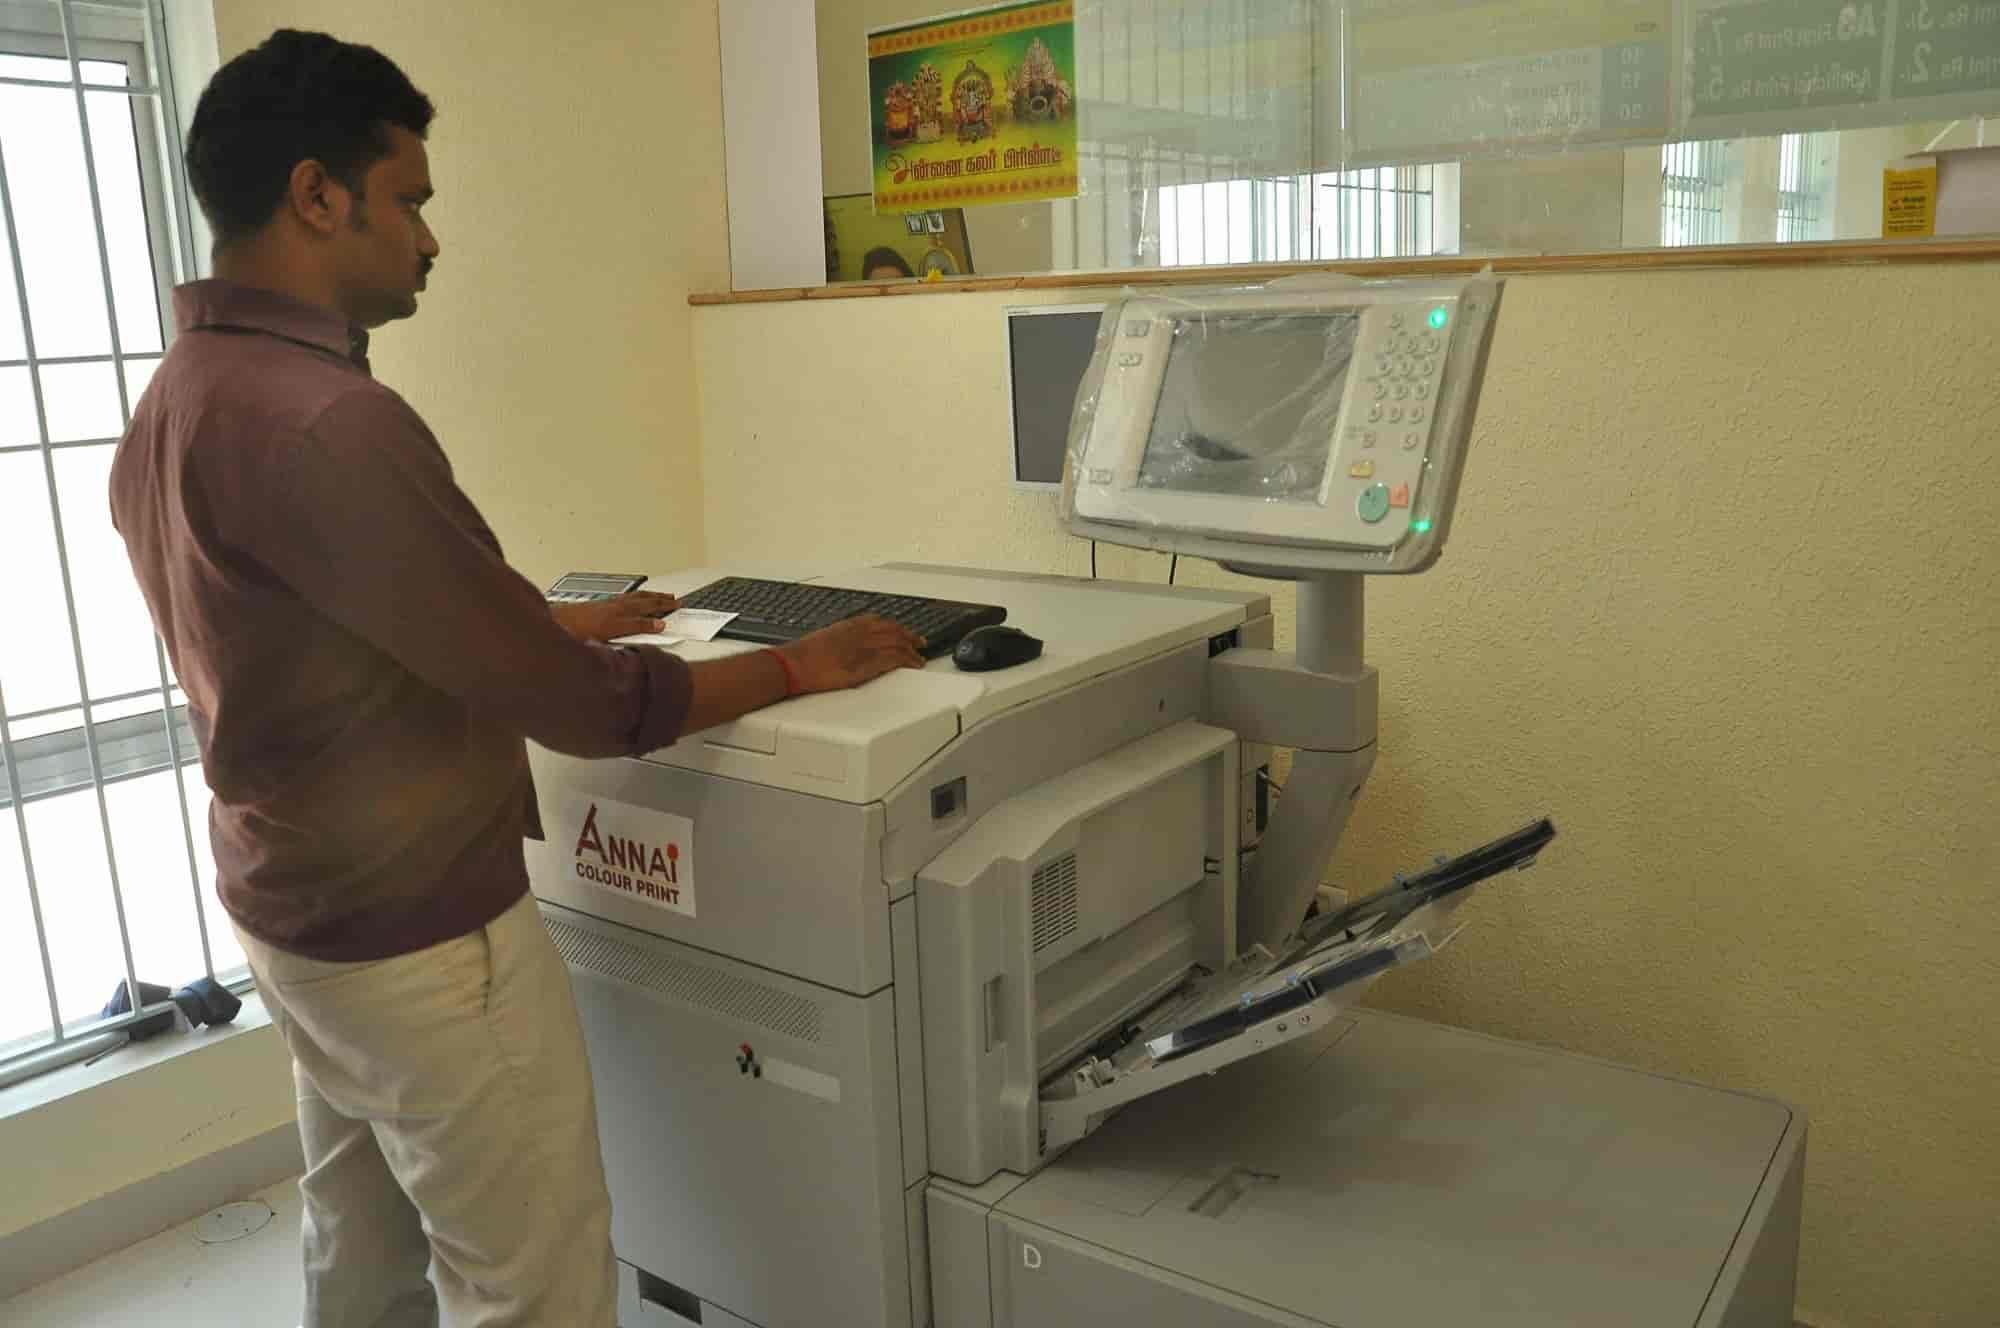 Annai Wedding Cards Printers And Multicolor Digital Print